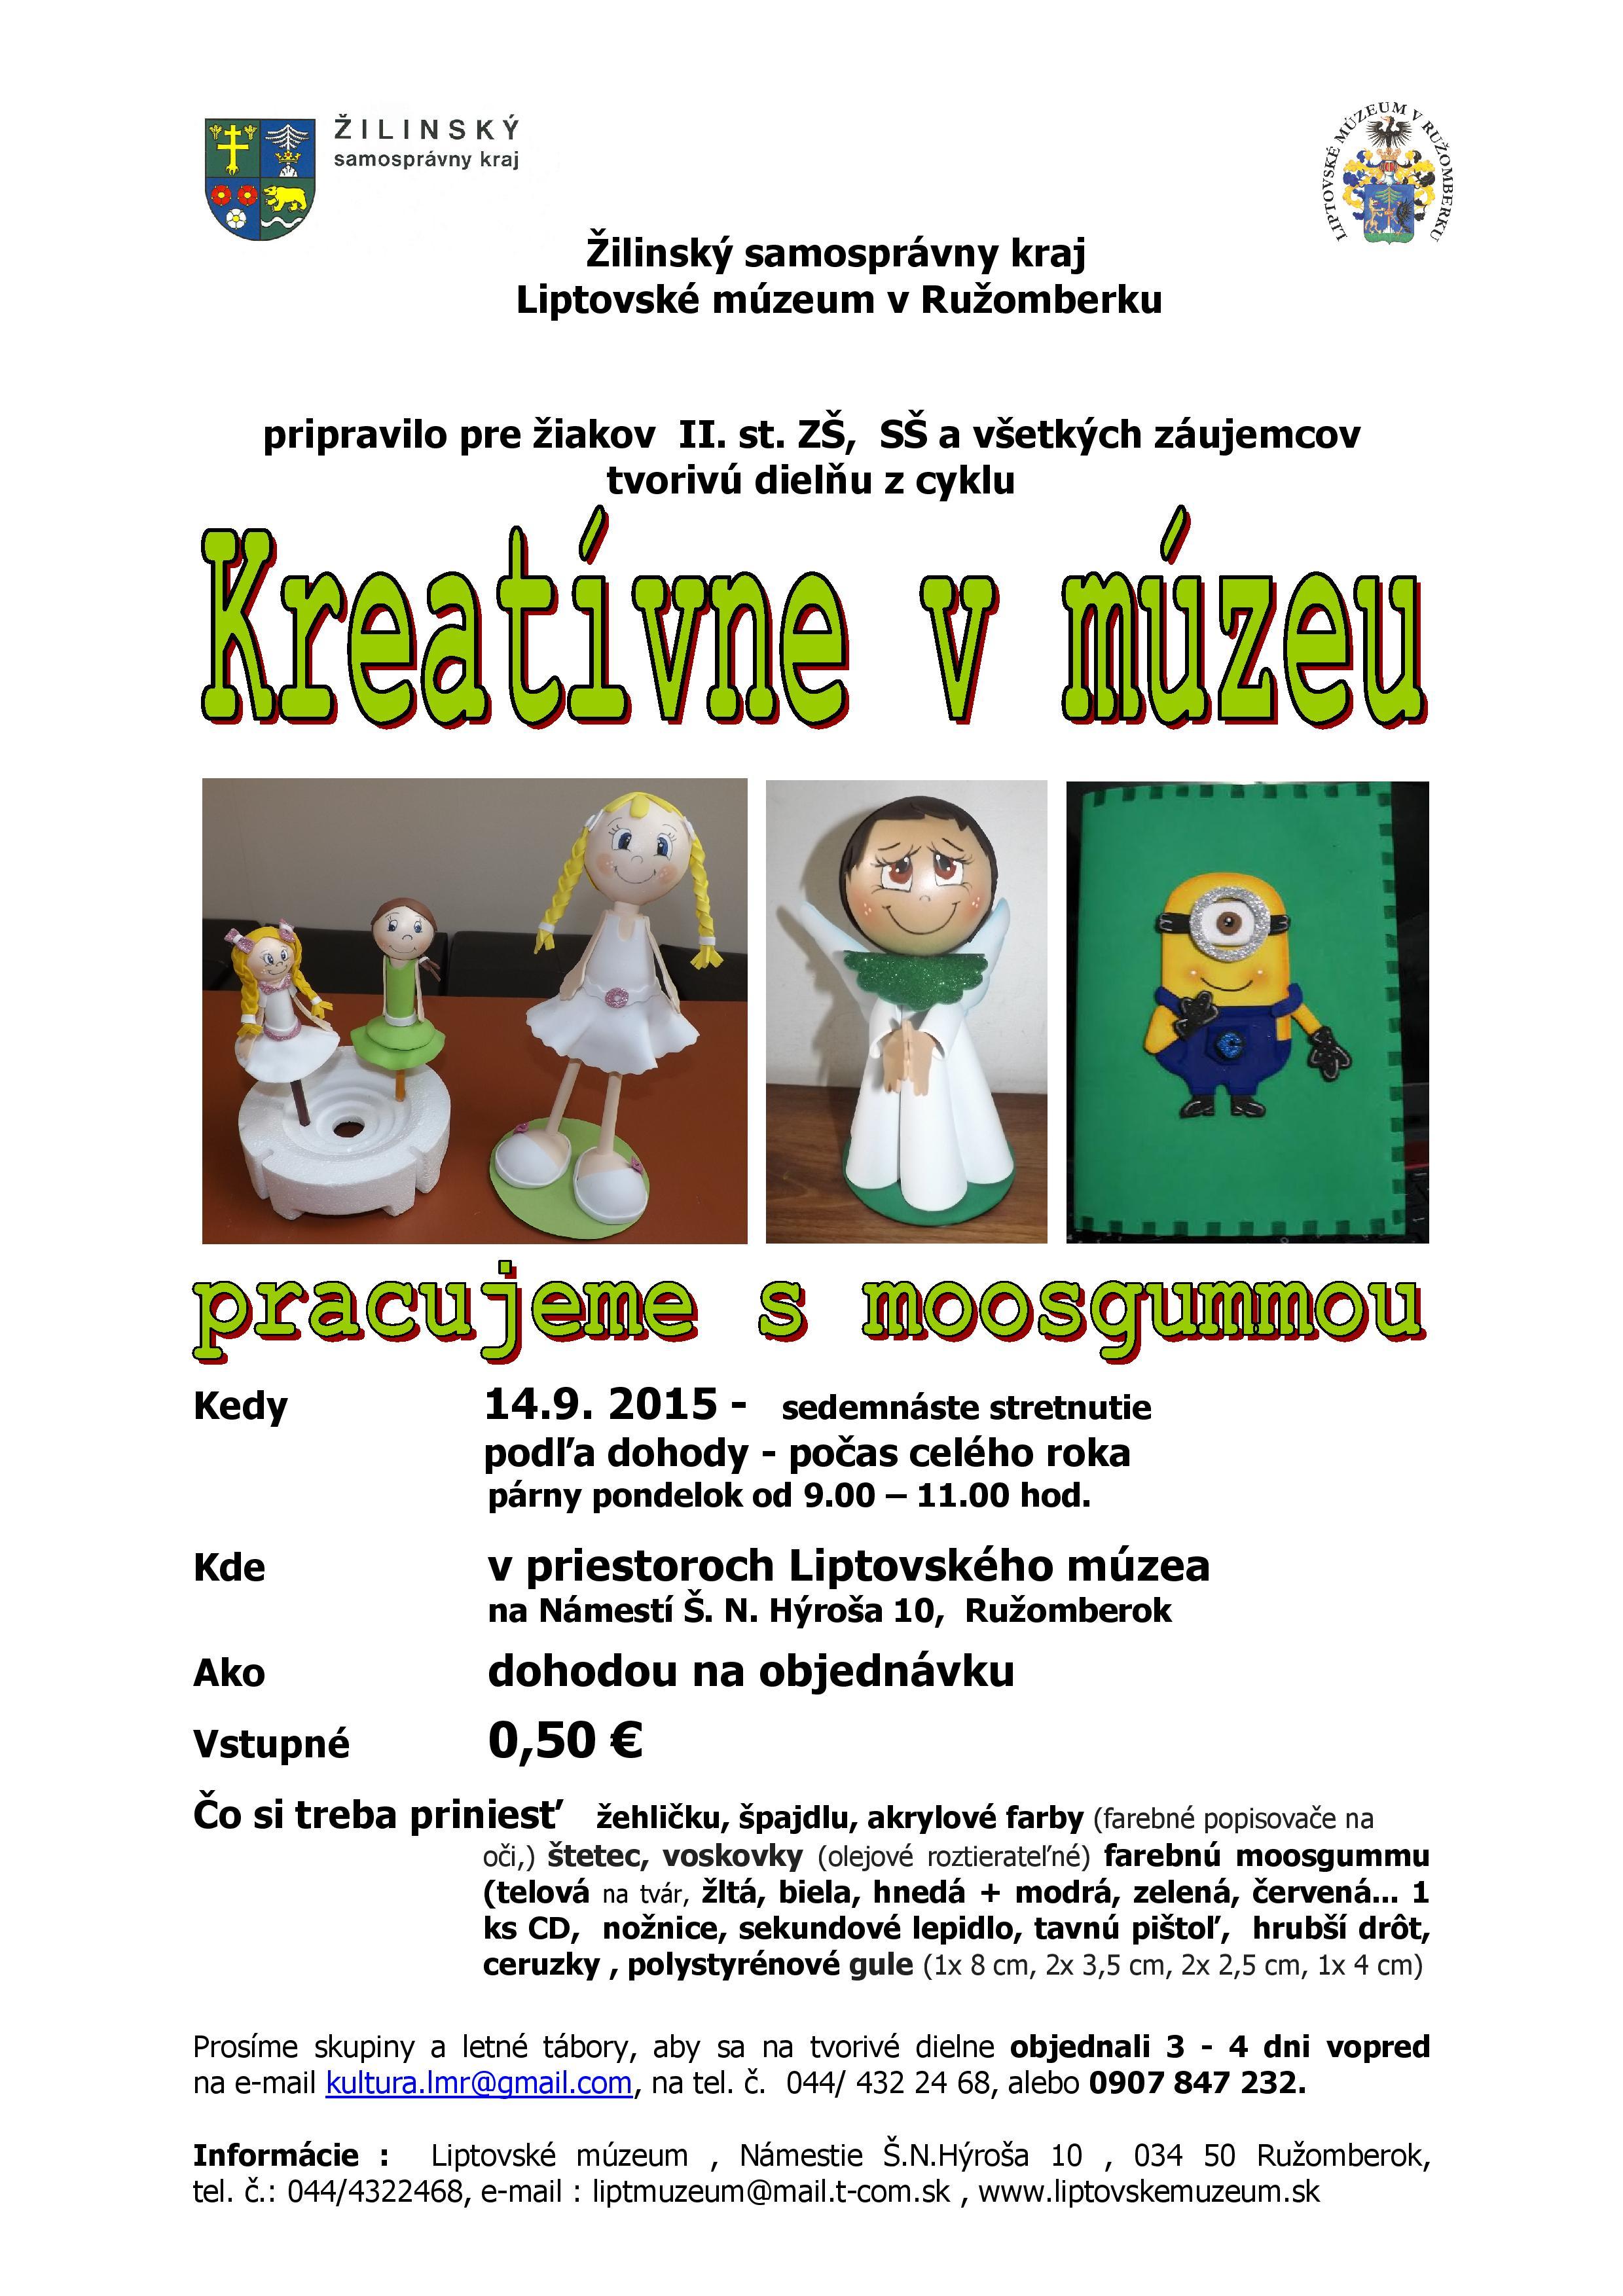 kvm-pracujeme-s-moosgummou-14-9-2015-plagat